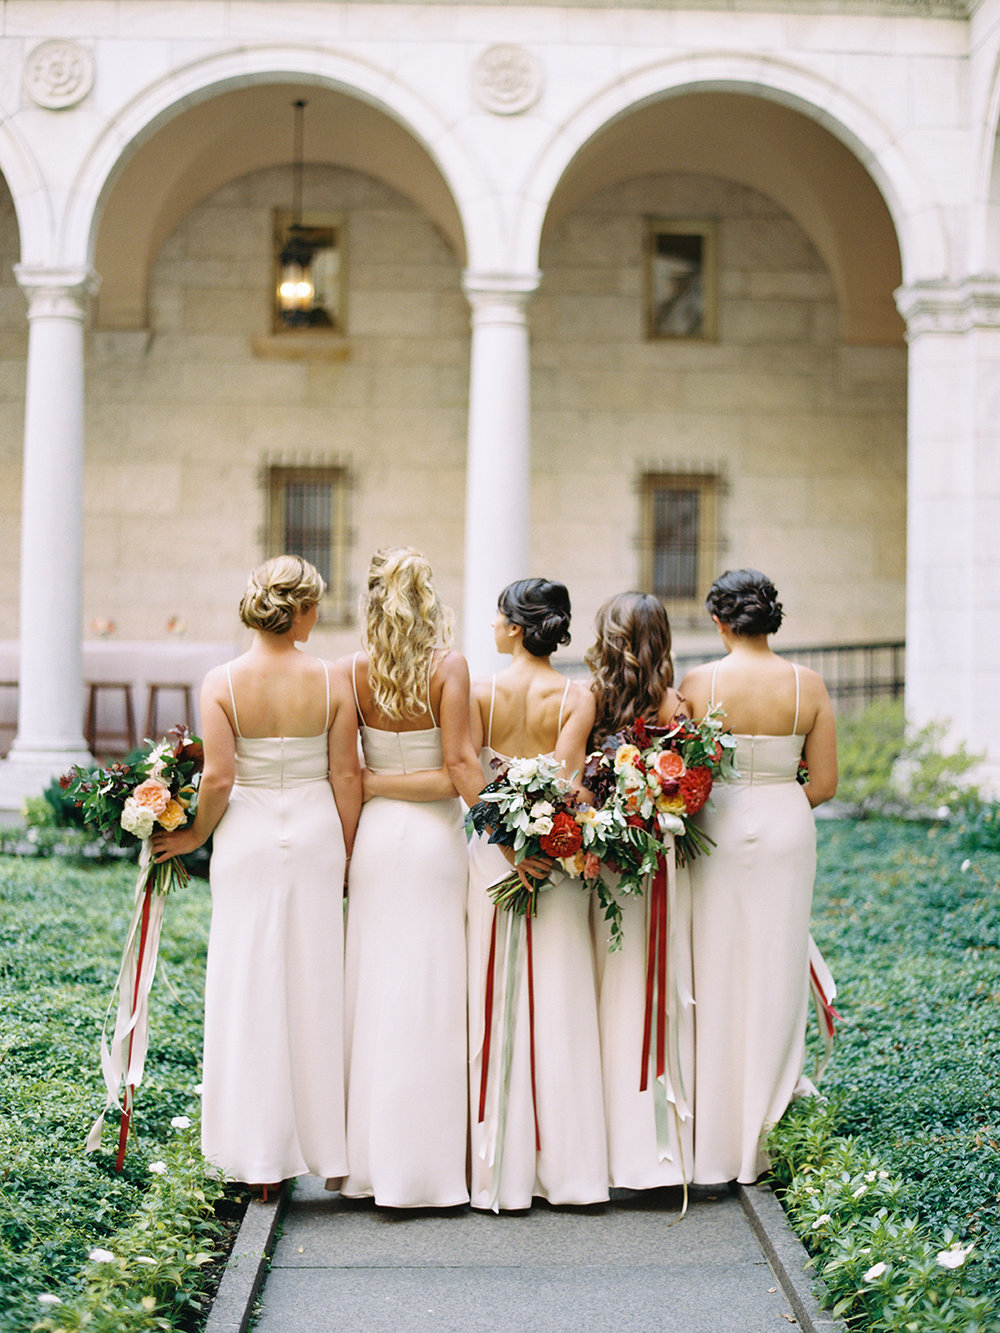 455_Kent+Katie_Fine_Art_Film_Photography_Boston_Public_Library_Wedding_Brumley & Wells.jpg